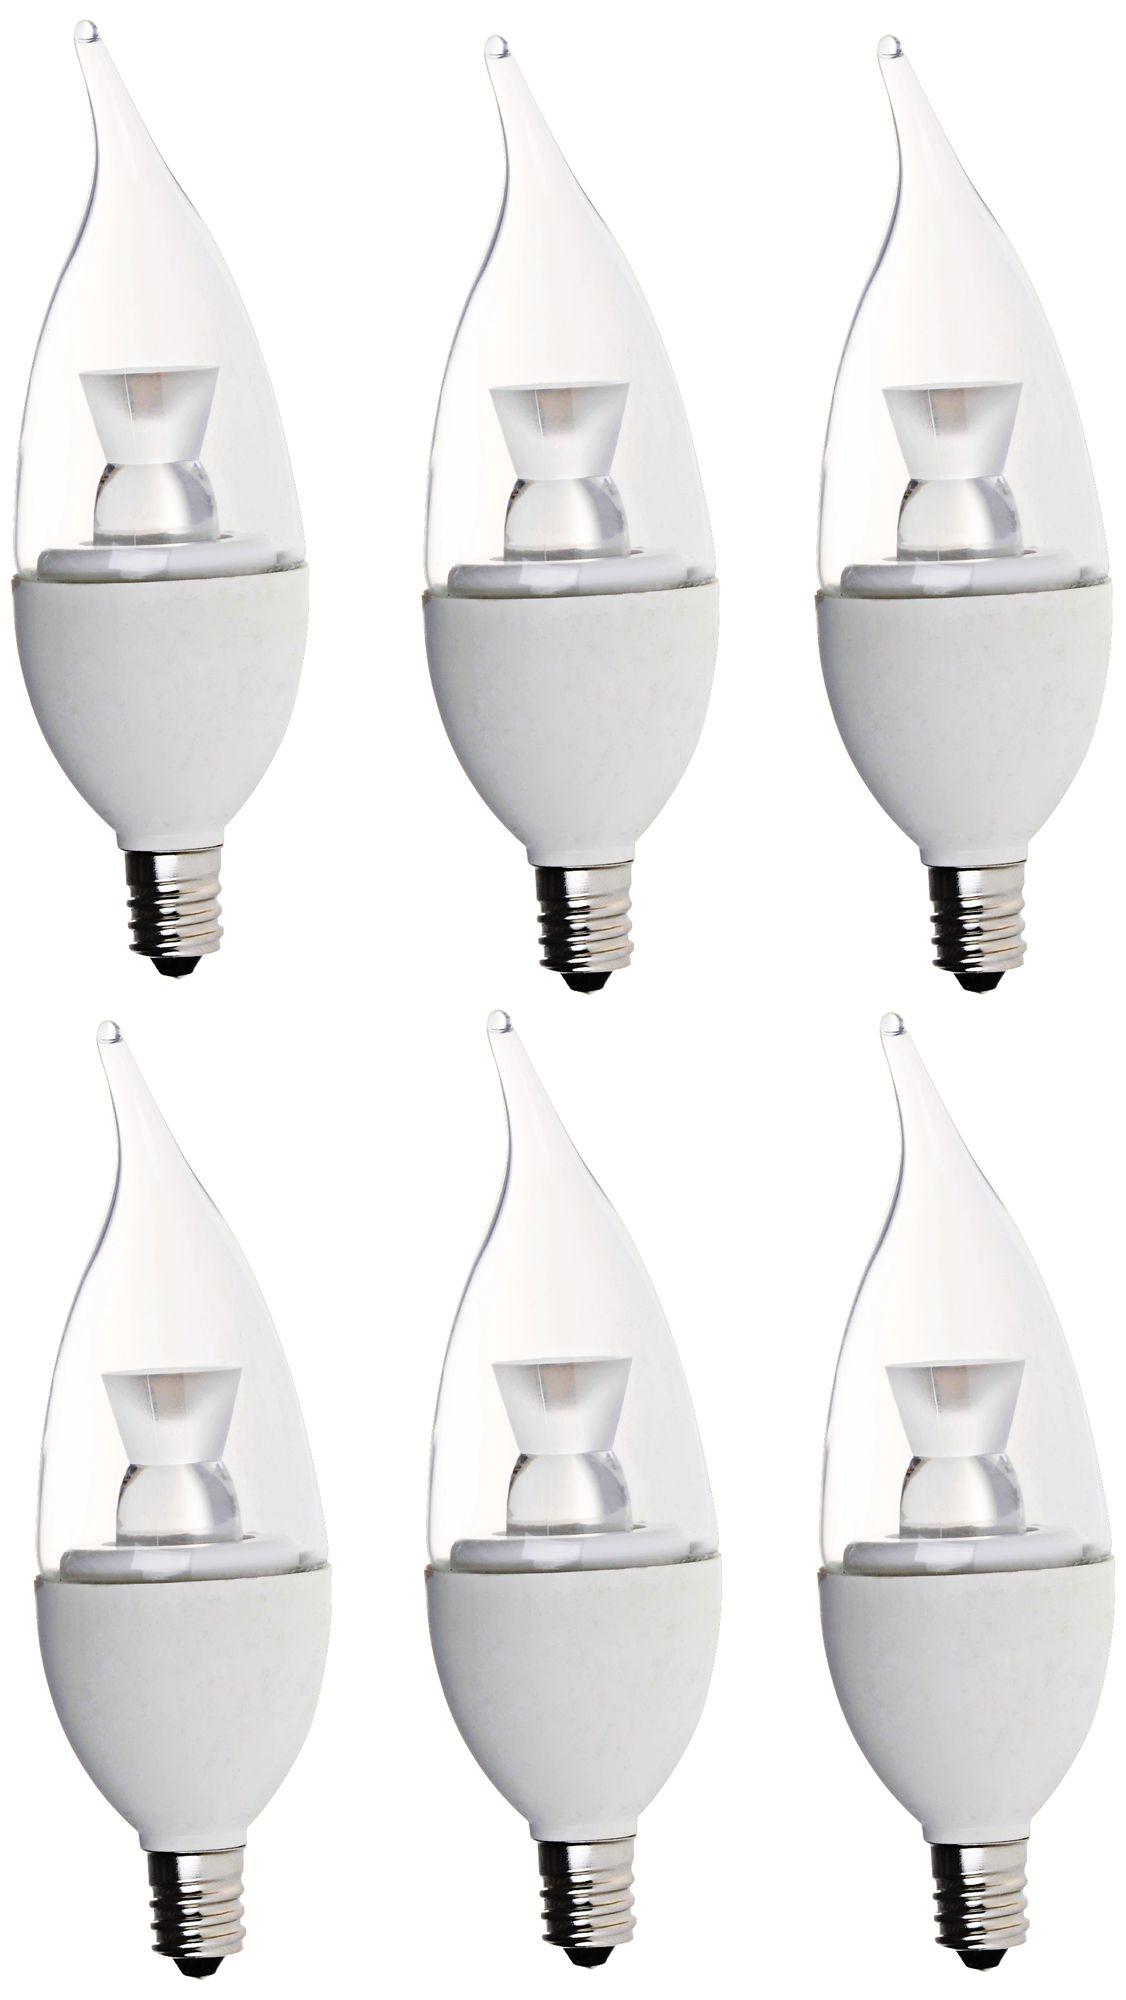 bioluz clear 5 watt dimmable led candelabra bulb pack of 6